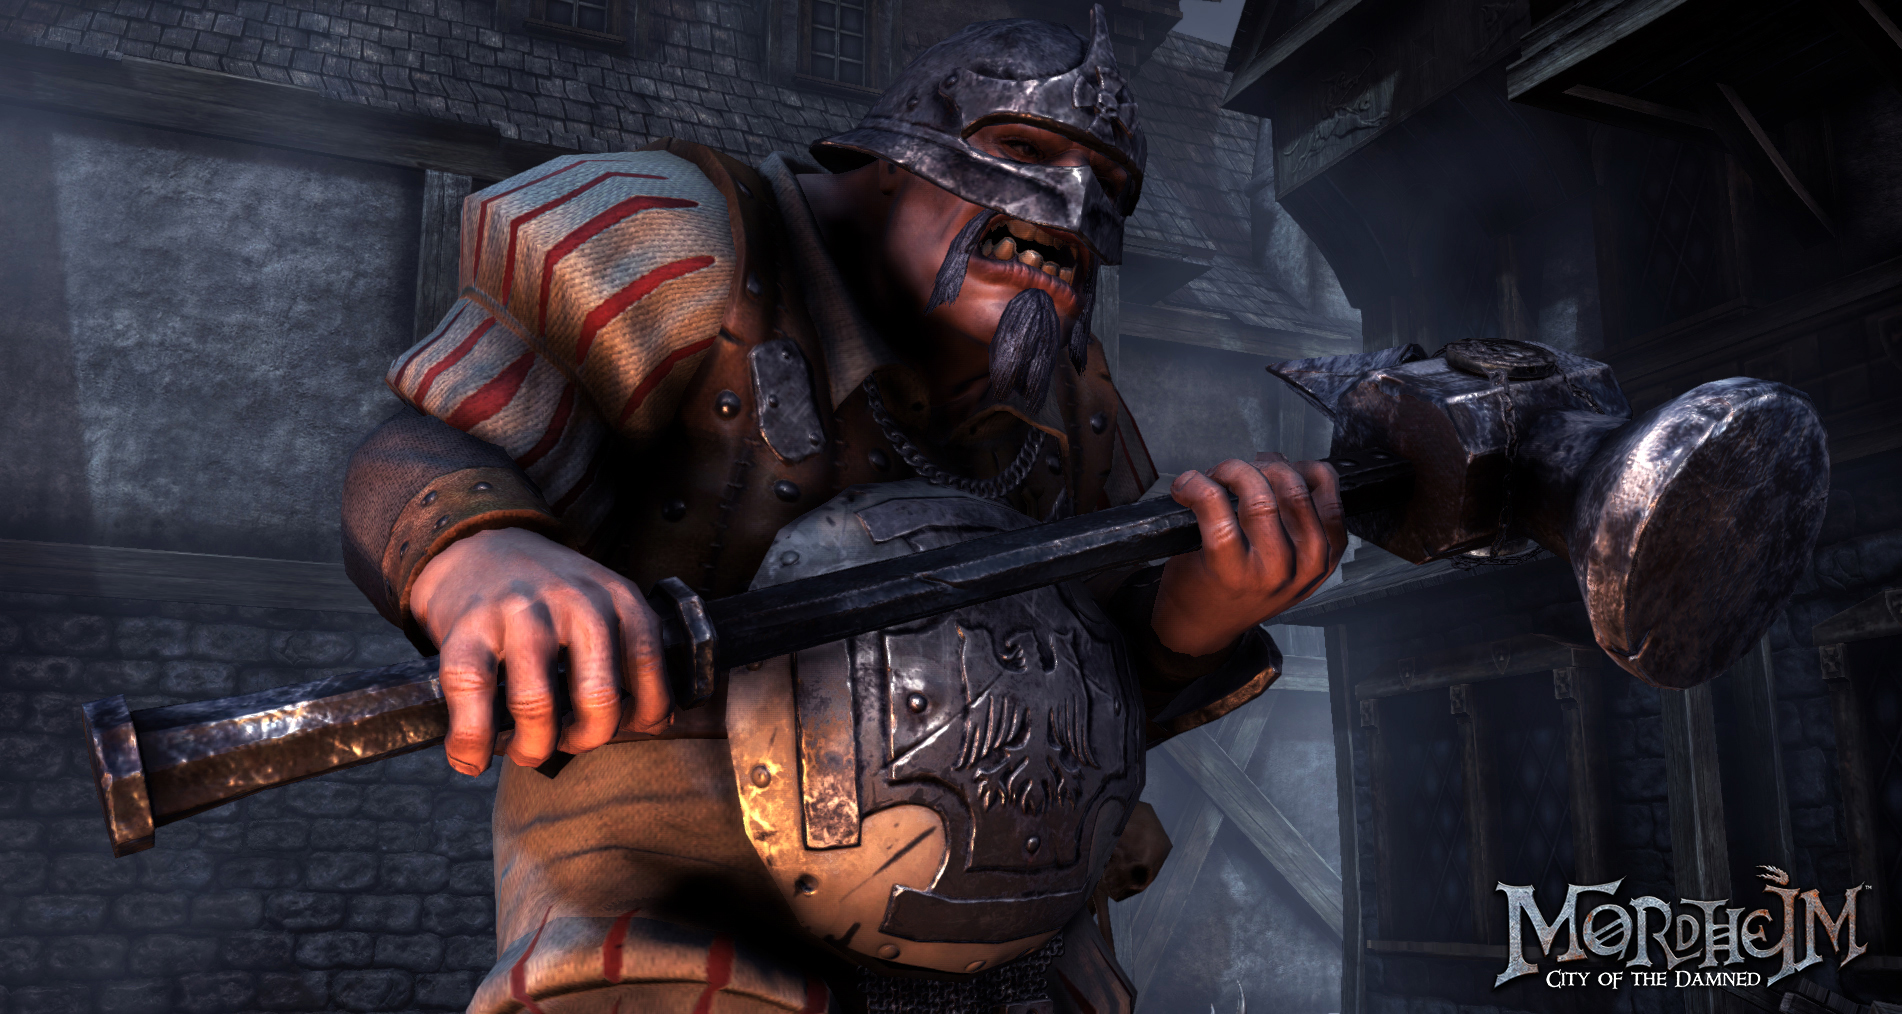 [Jeu vidéo] Mordheim : City of the Damned (PC) 895281Mordheim09